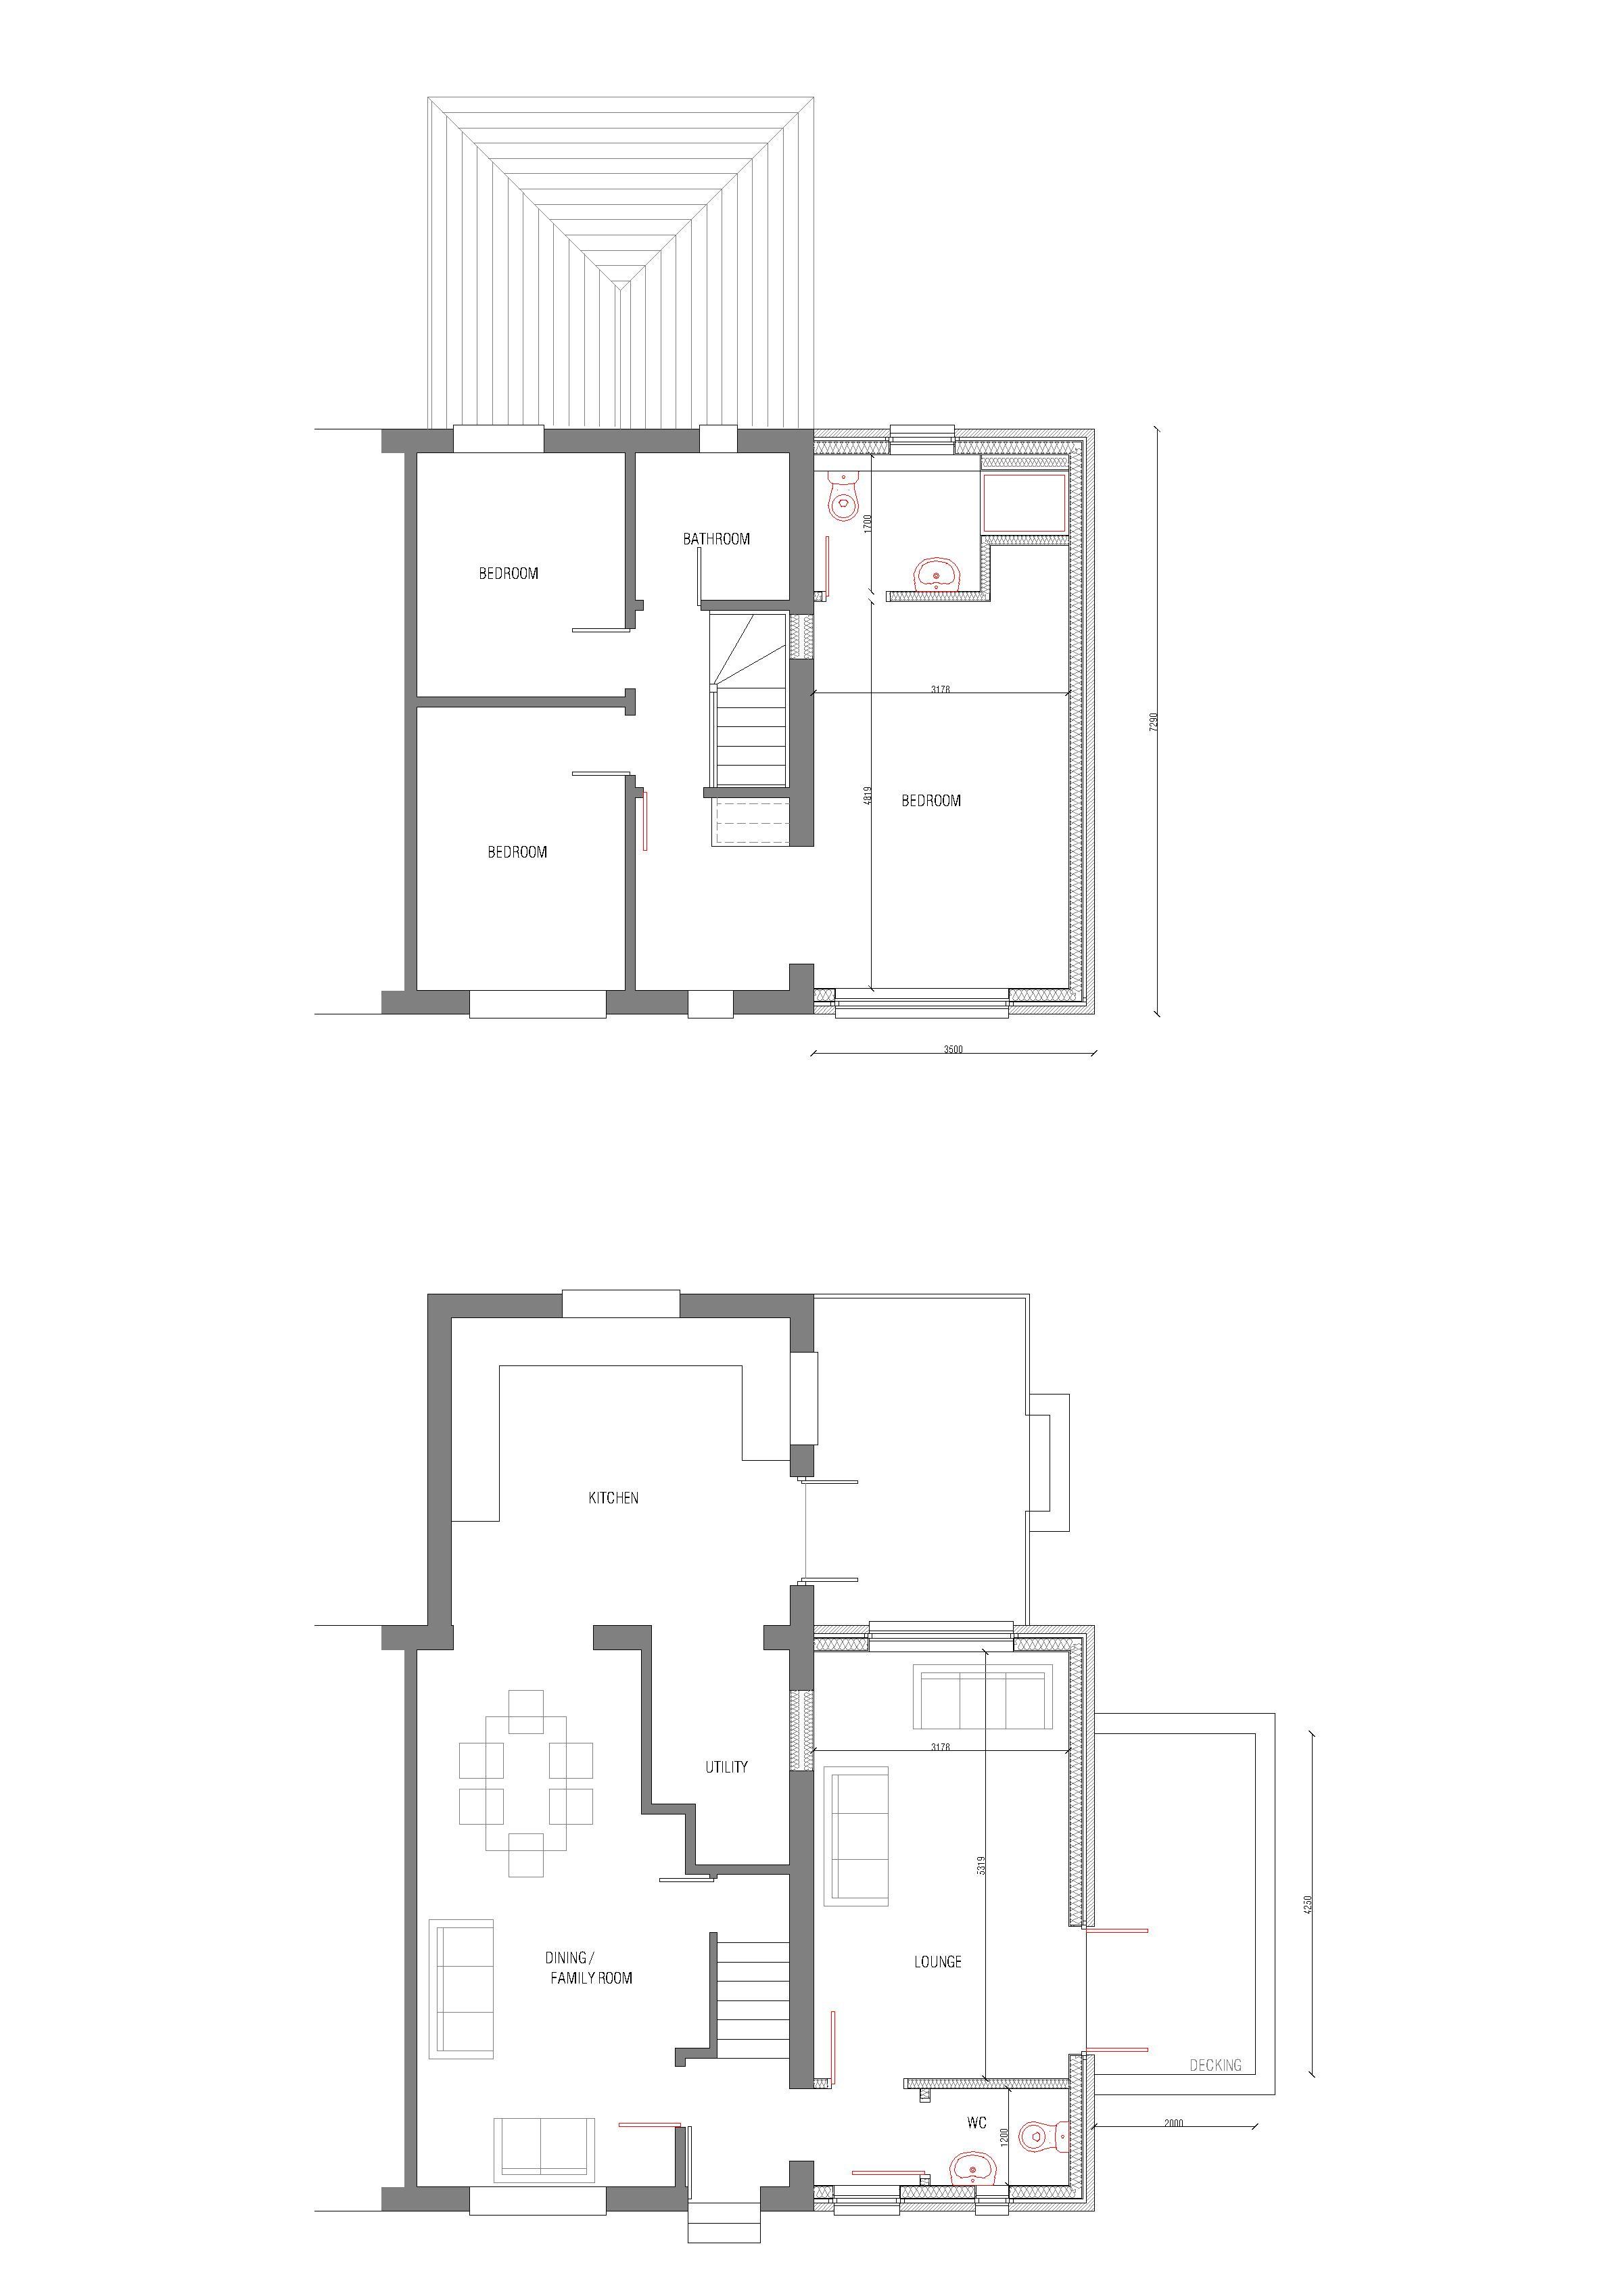 Extension floor plans view floor plans g rv garage for Extension floor plans